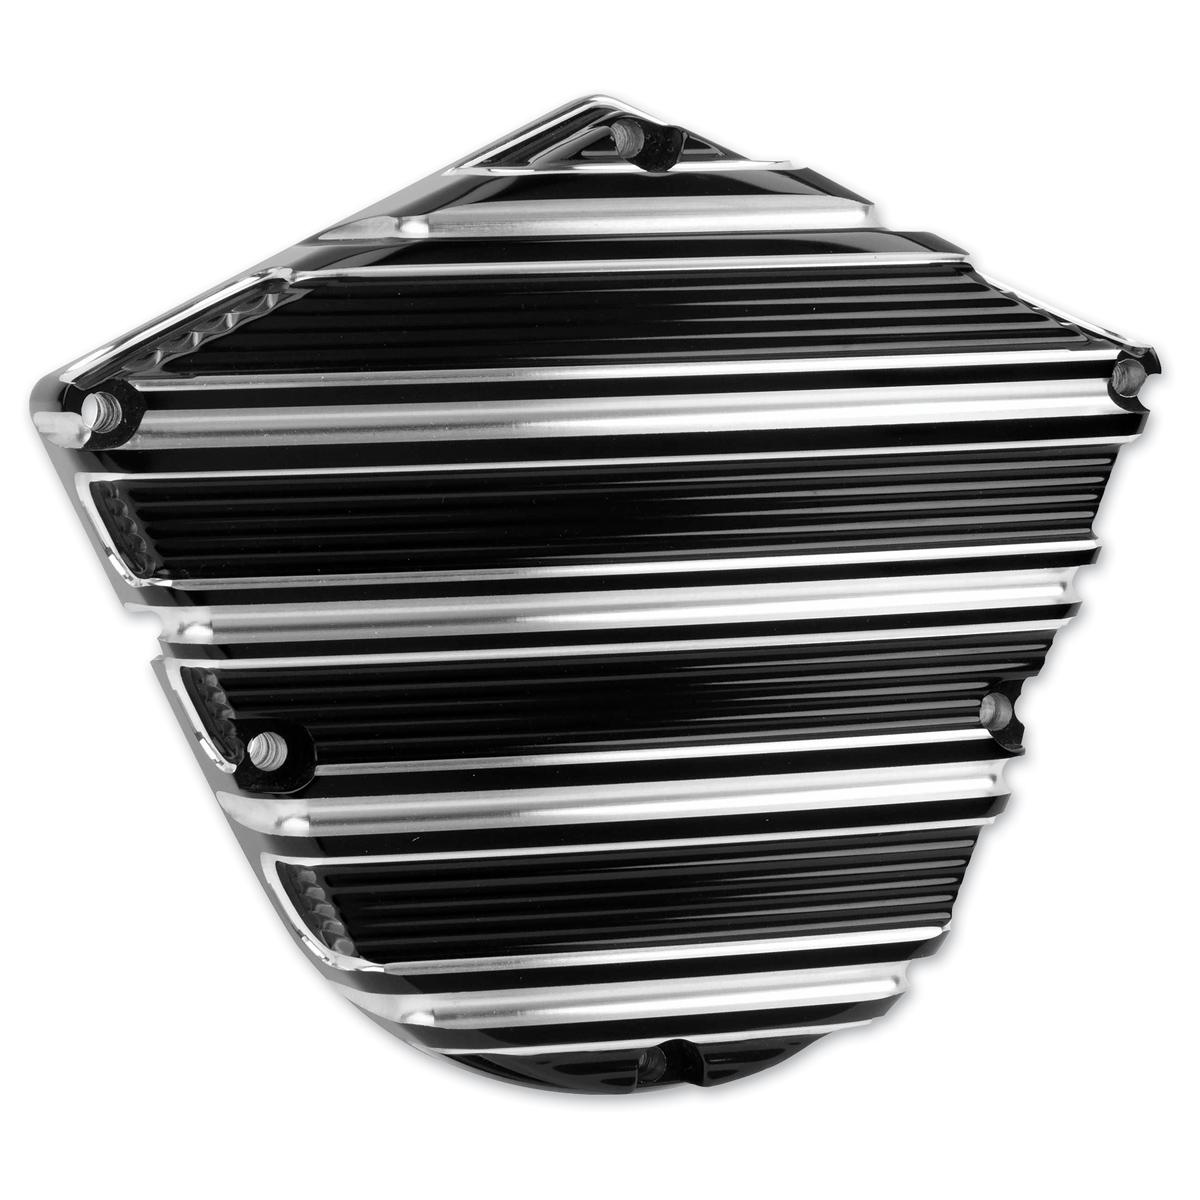 Arlen Ness 10-Gauge Cam Shell Cover Black